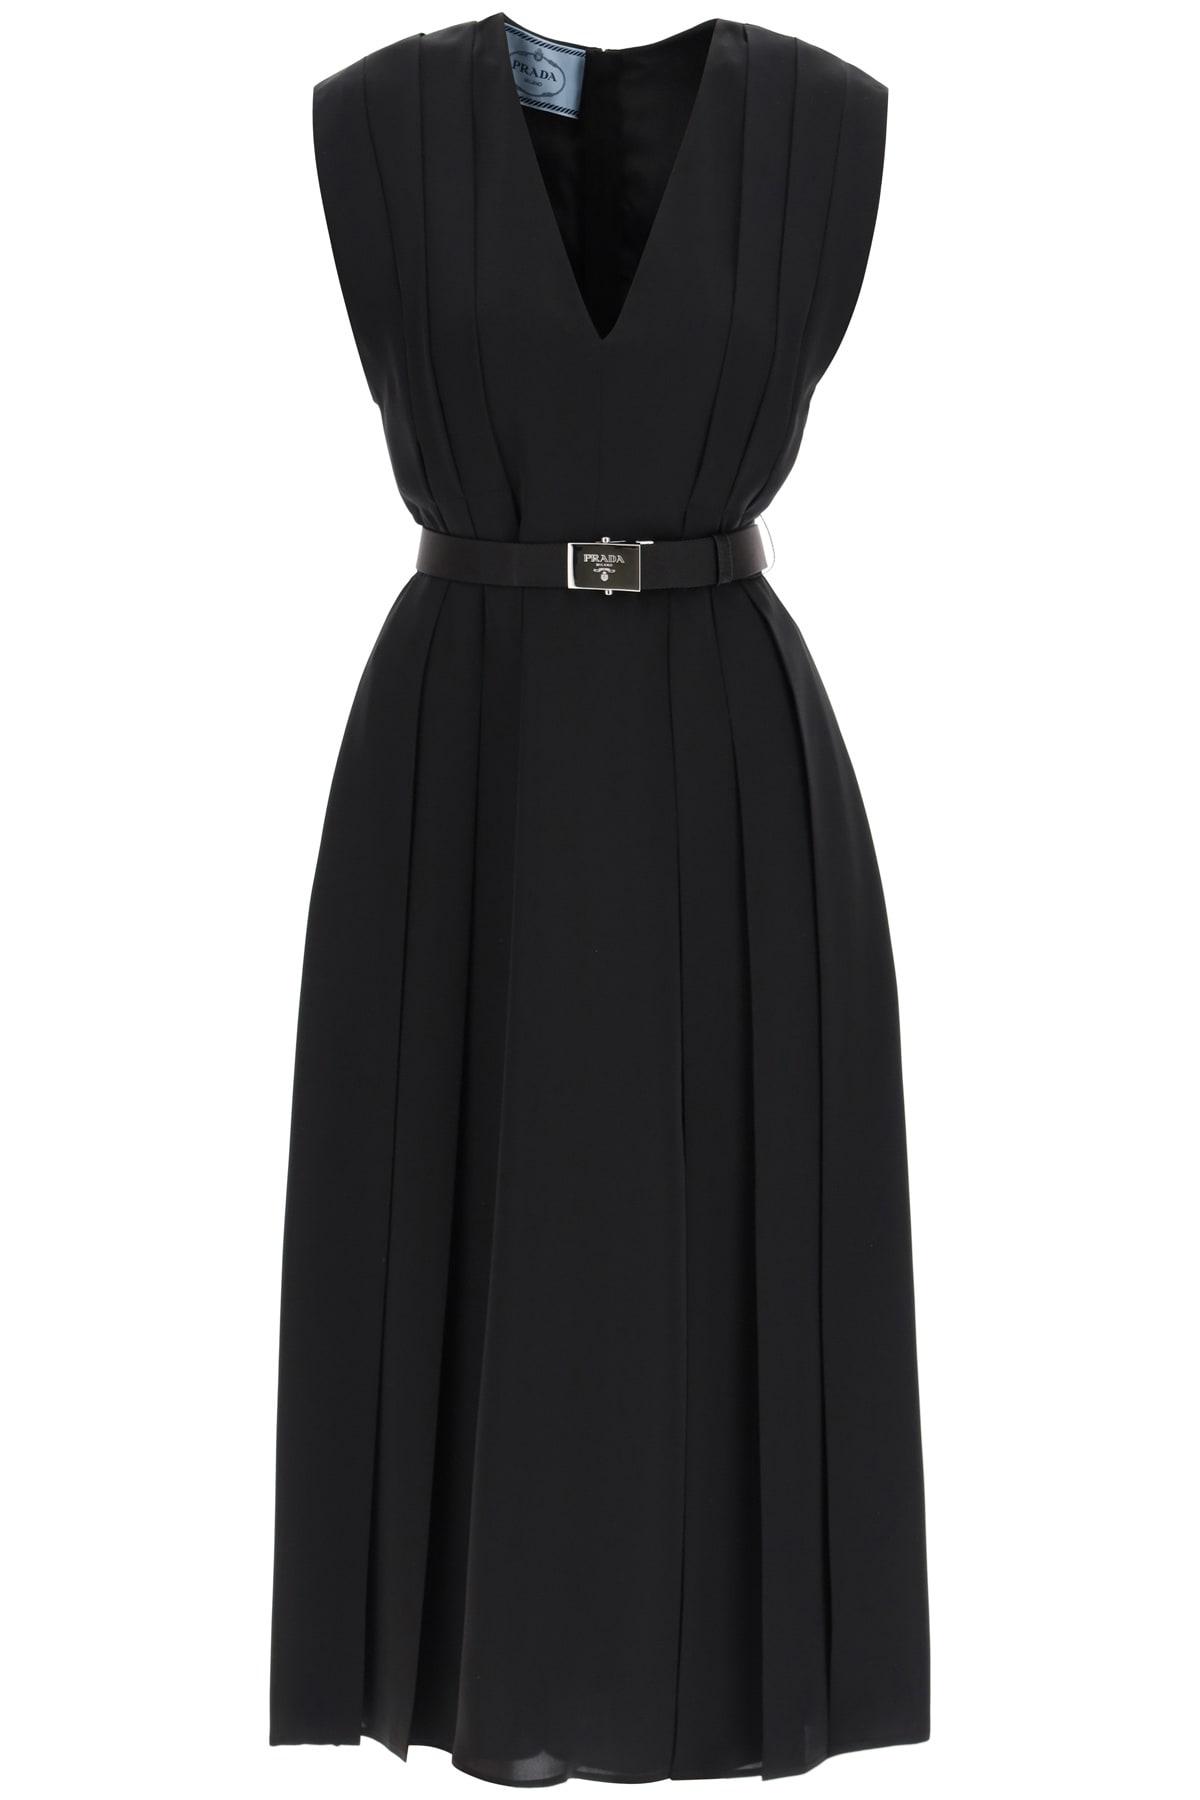 Prada Fluid Pong·Midi Dress